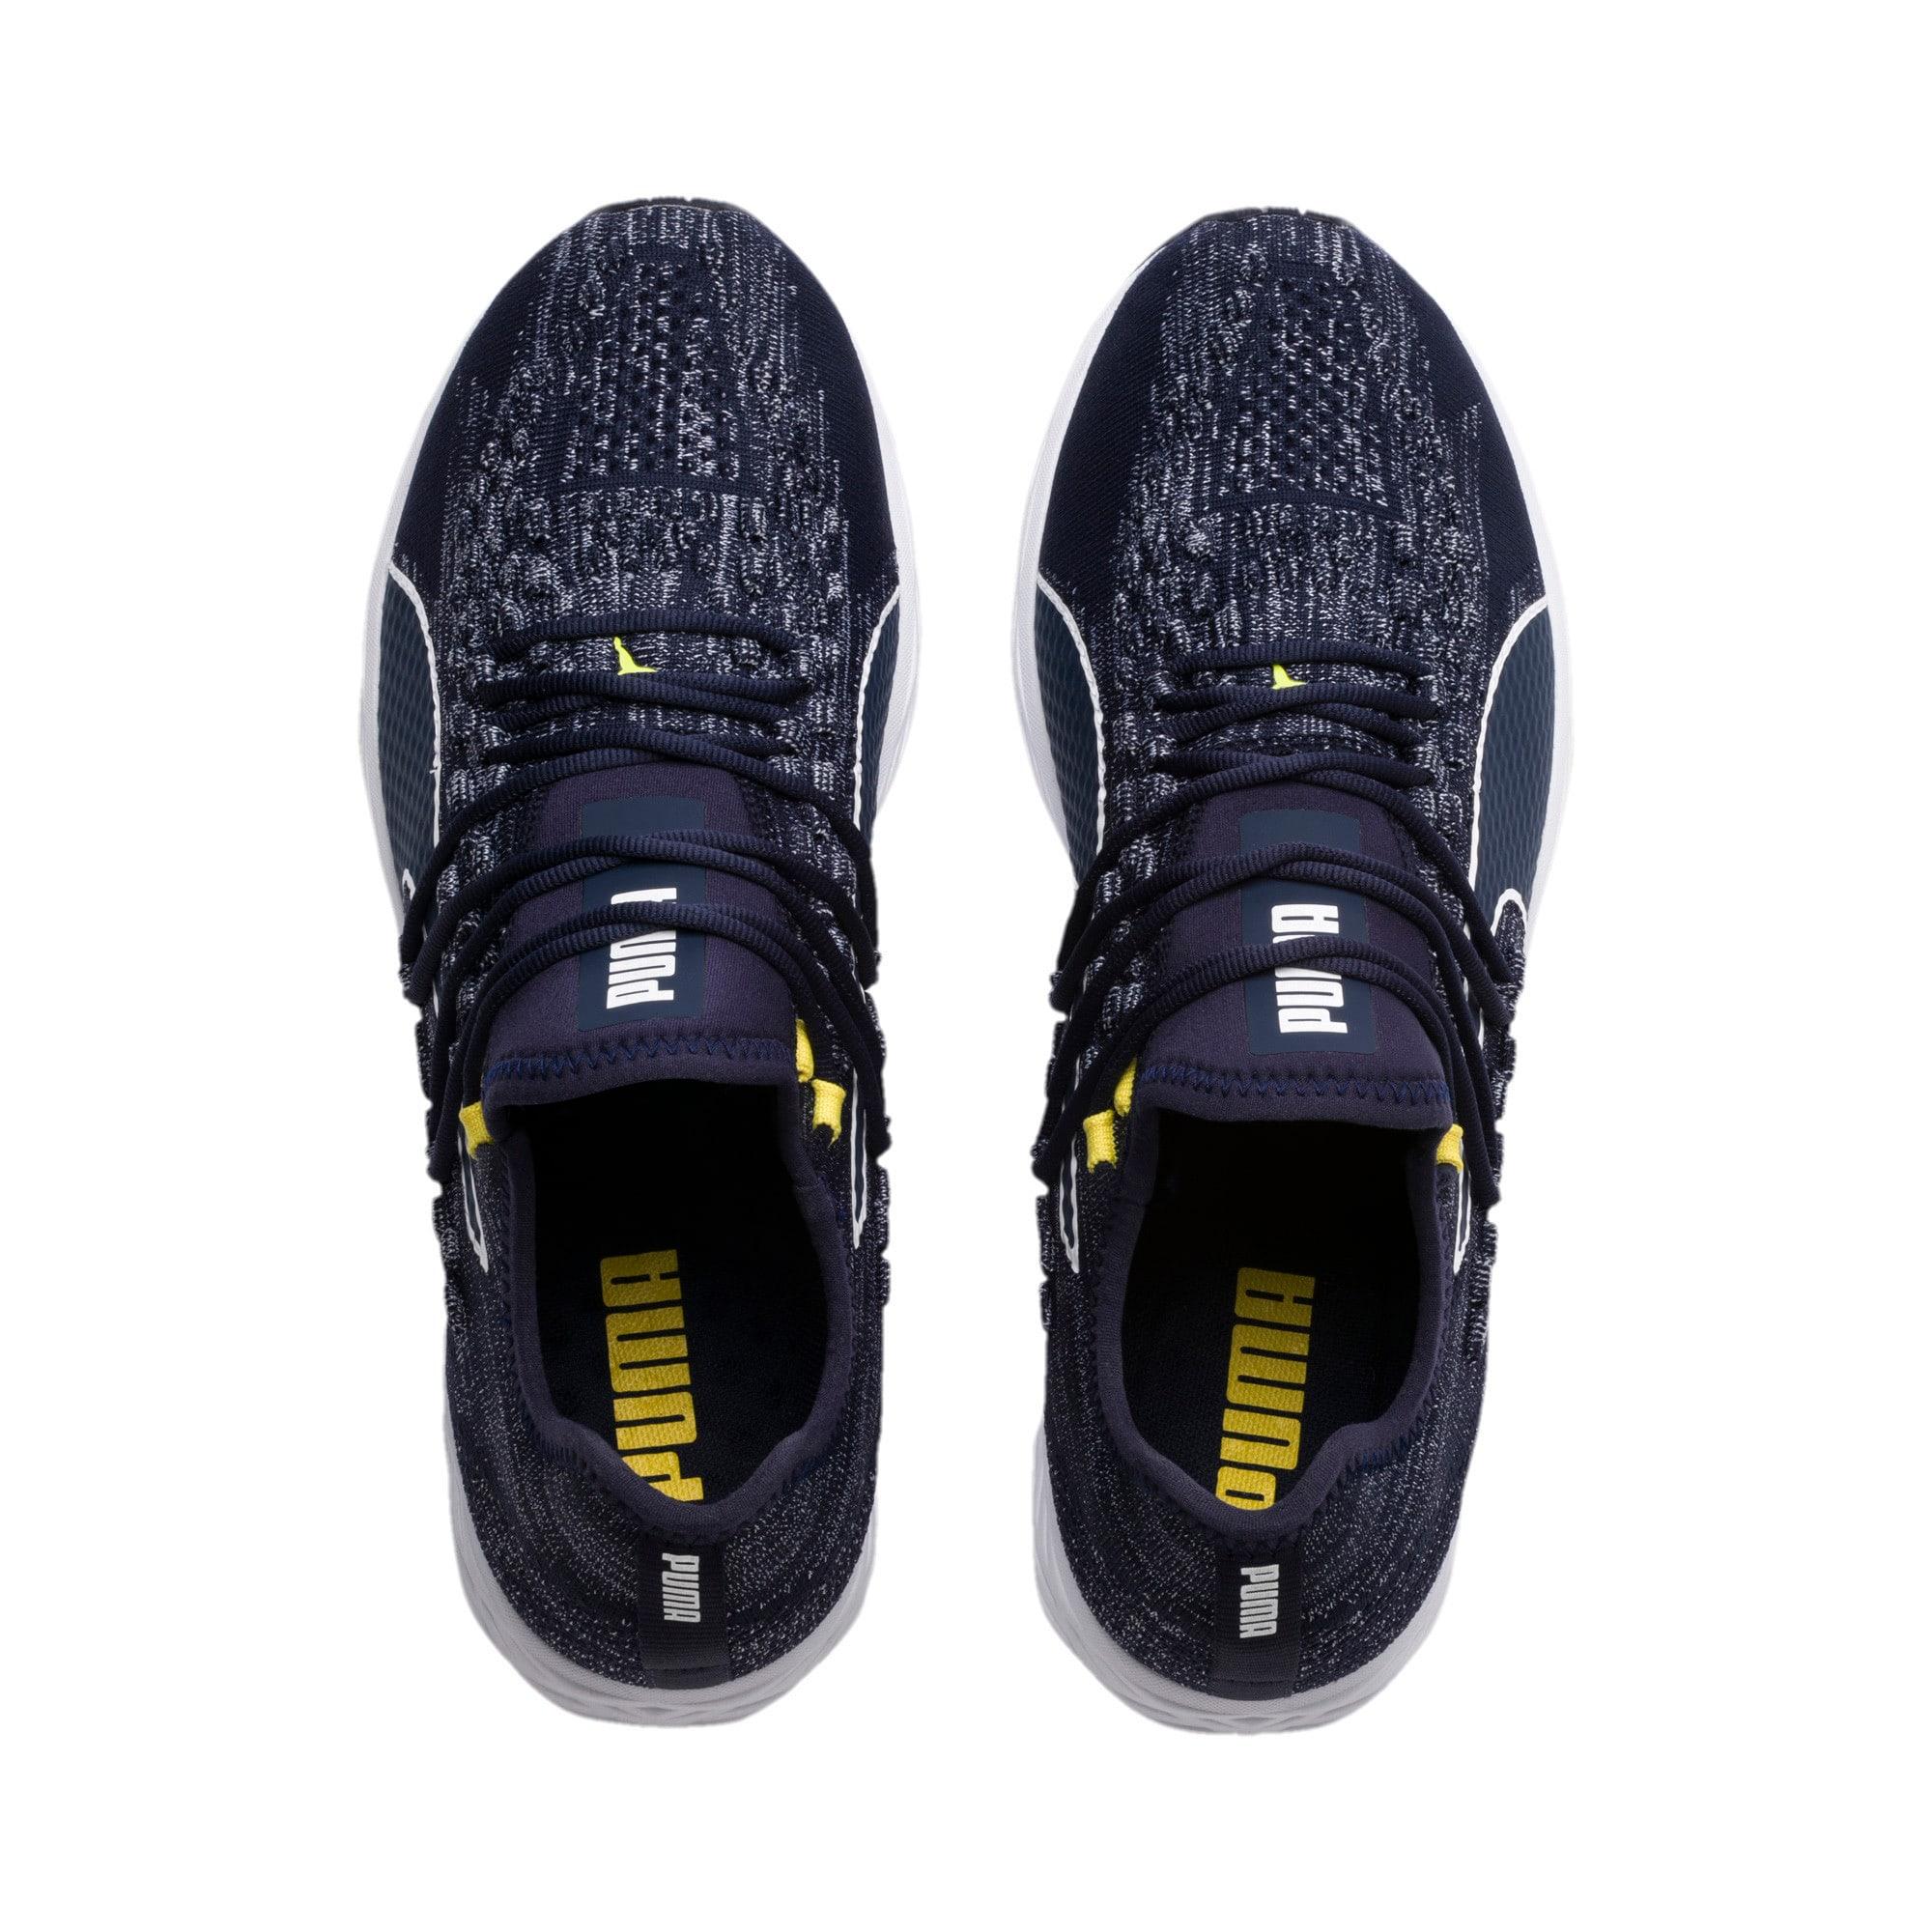 Thumbnail 6 of SPEED RACER Men's Running Shoes, Peacoat-White-Blazing Yellow, medium-IND